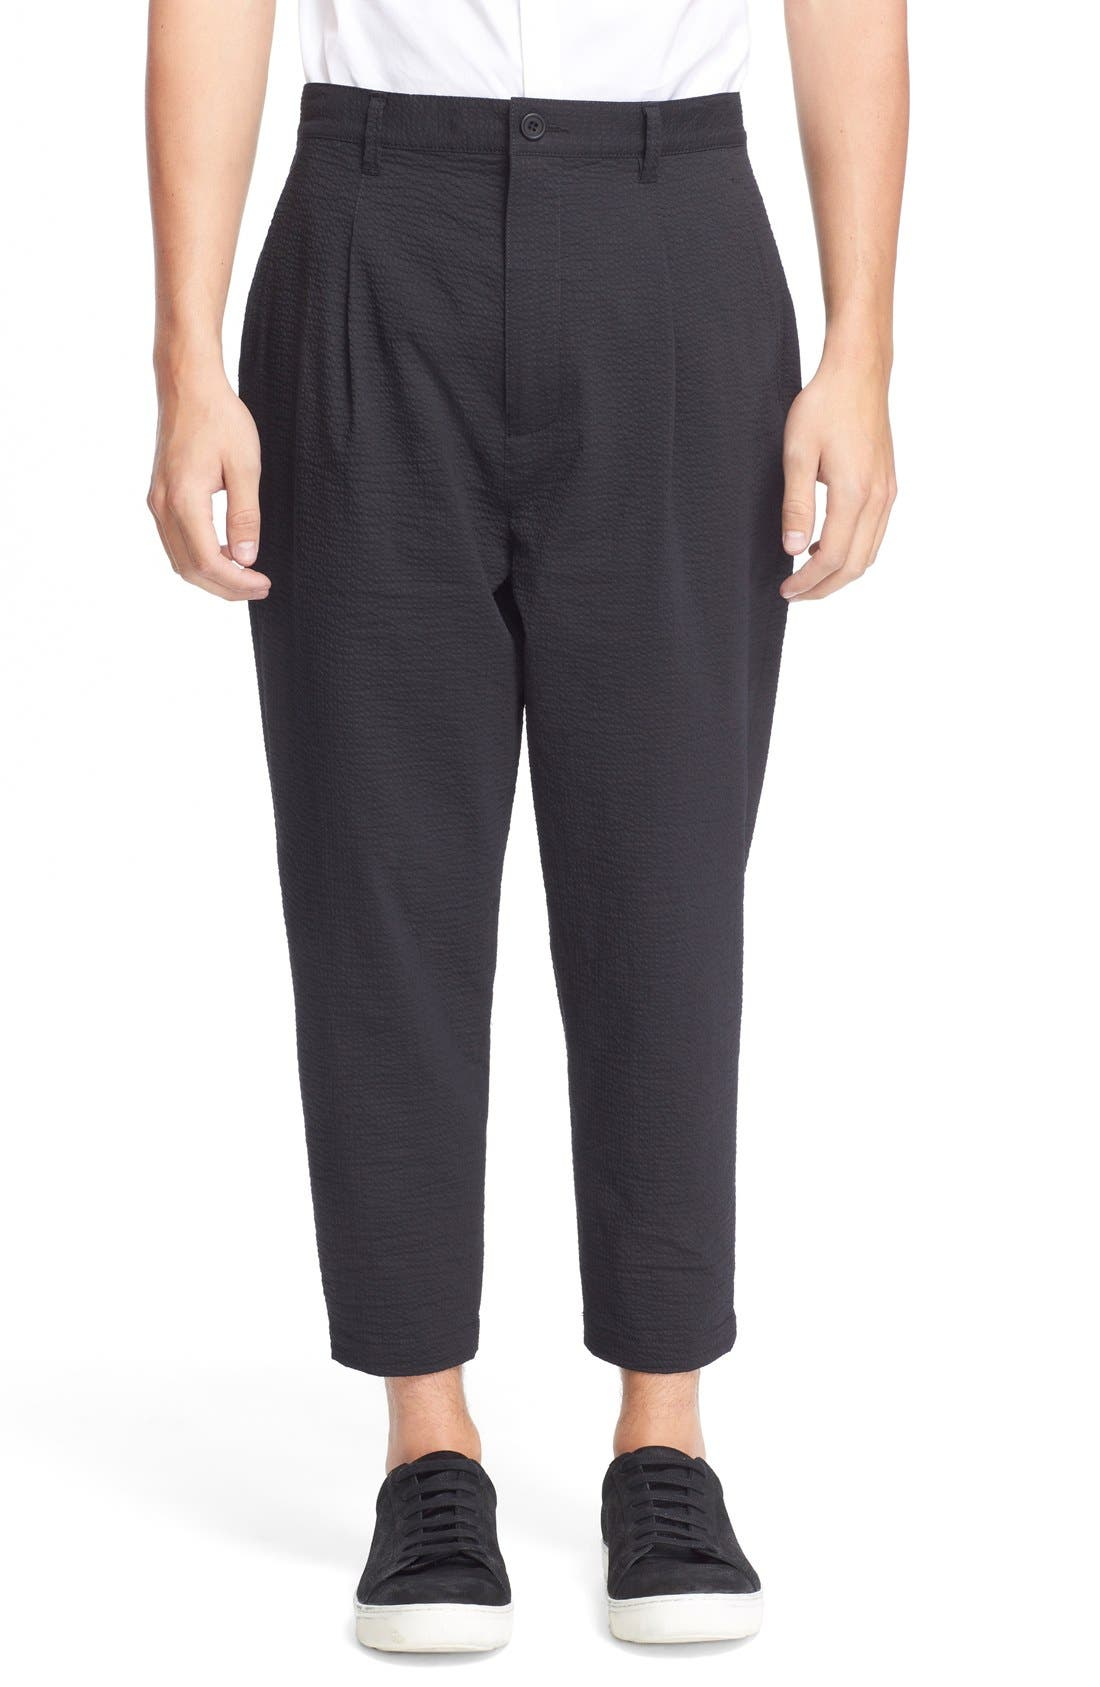 HELMUT LANG Seersucker Trousers, Main, color, 001